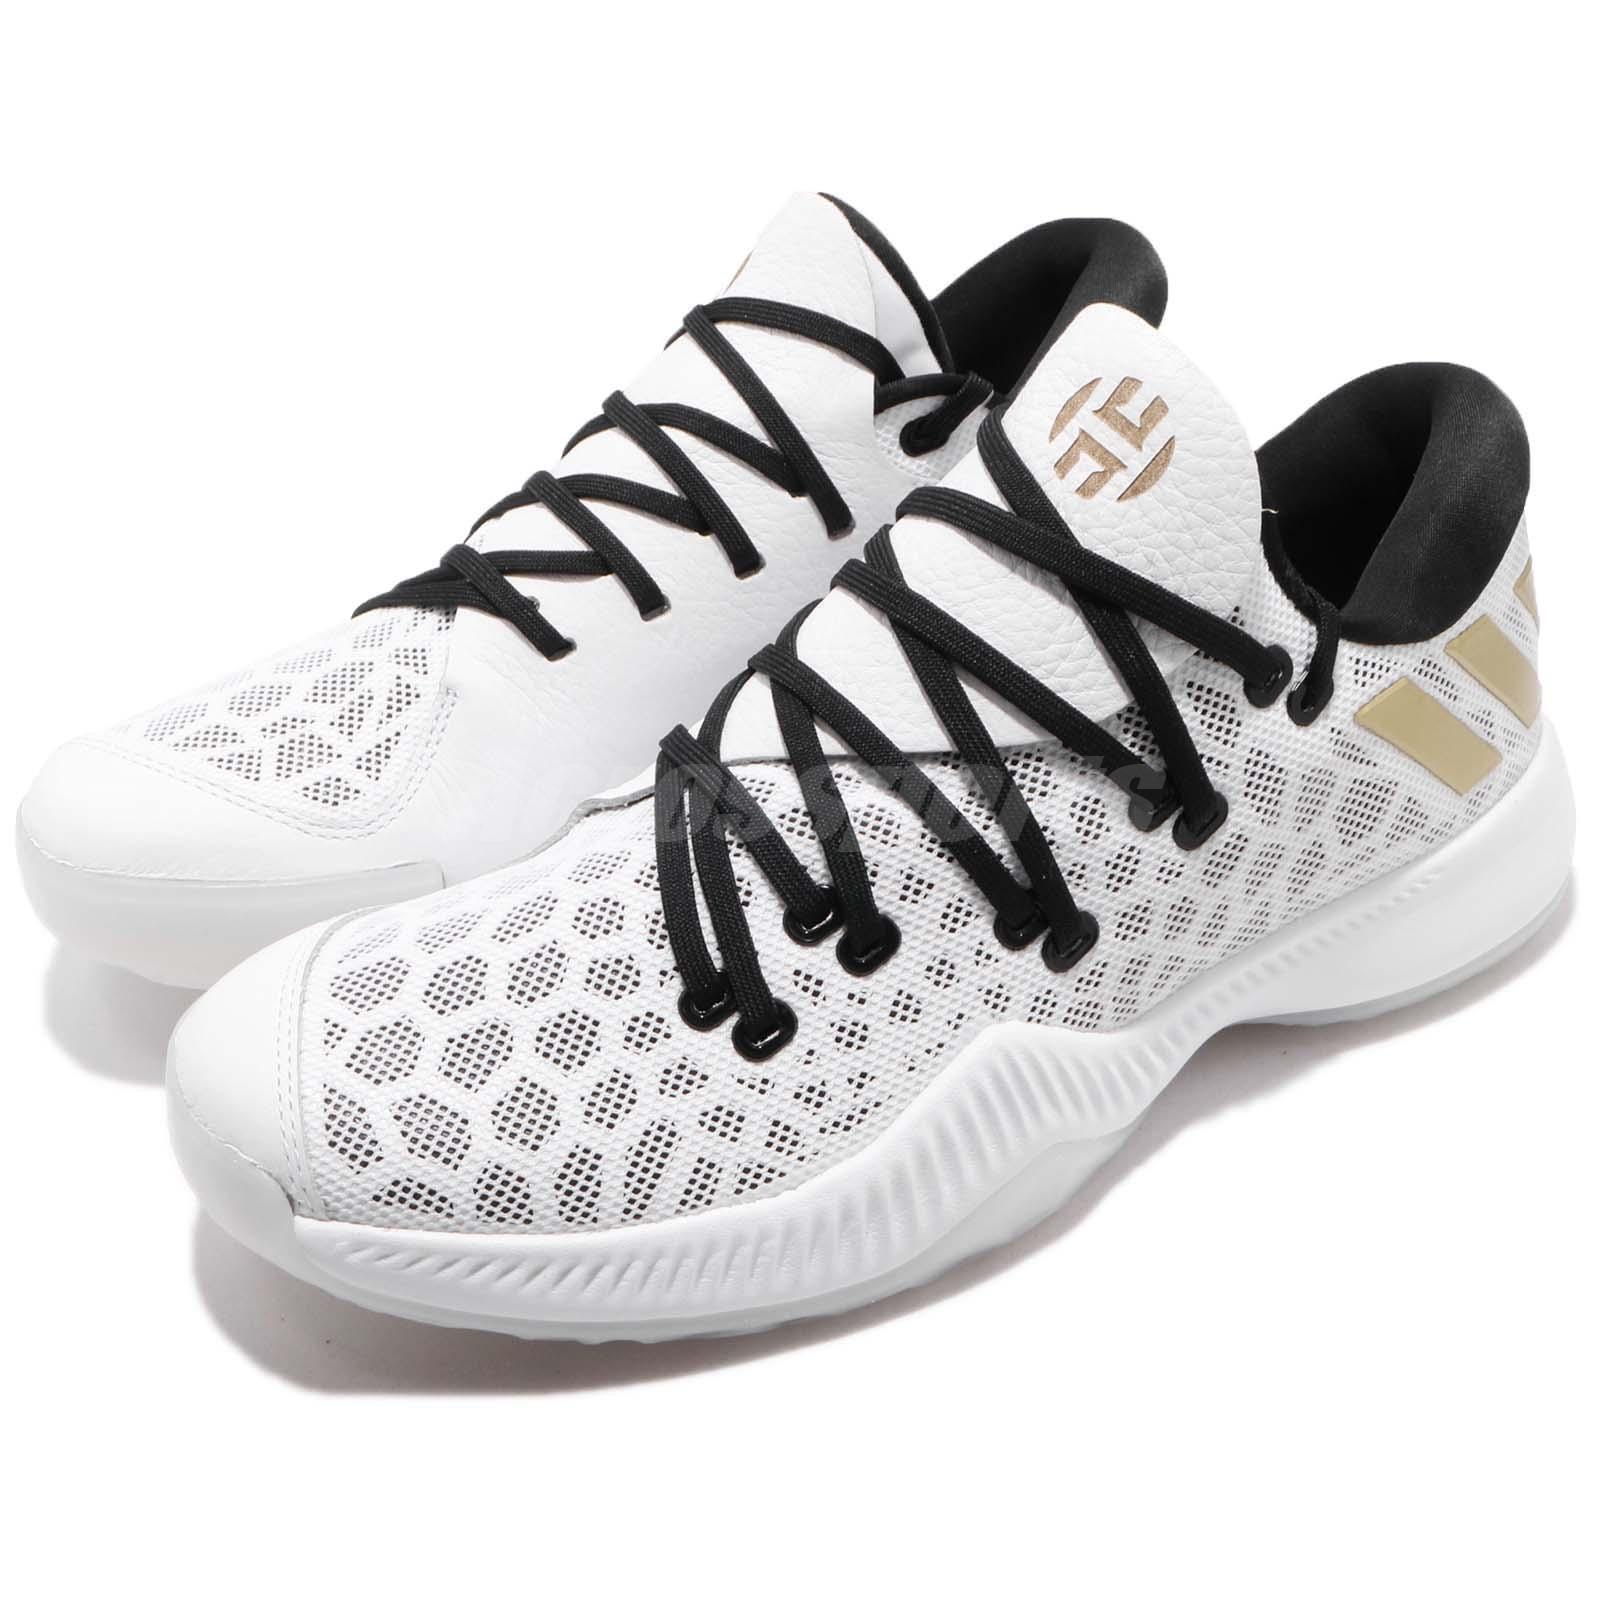 Adidas Harden B E James Harden White Black gold gold gold Men Basketball shoes AC7821 8405c8